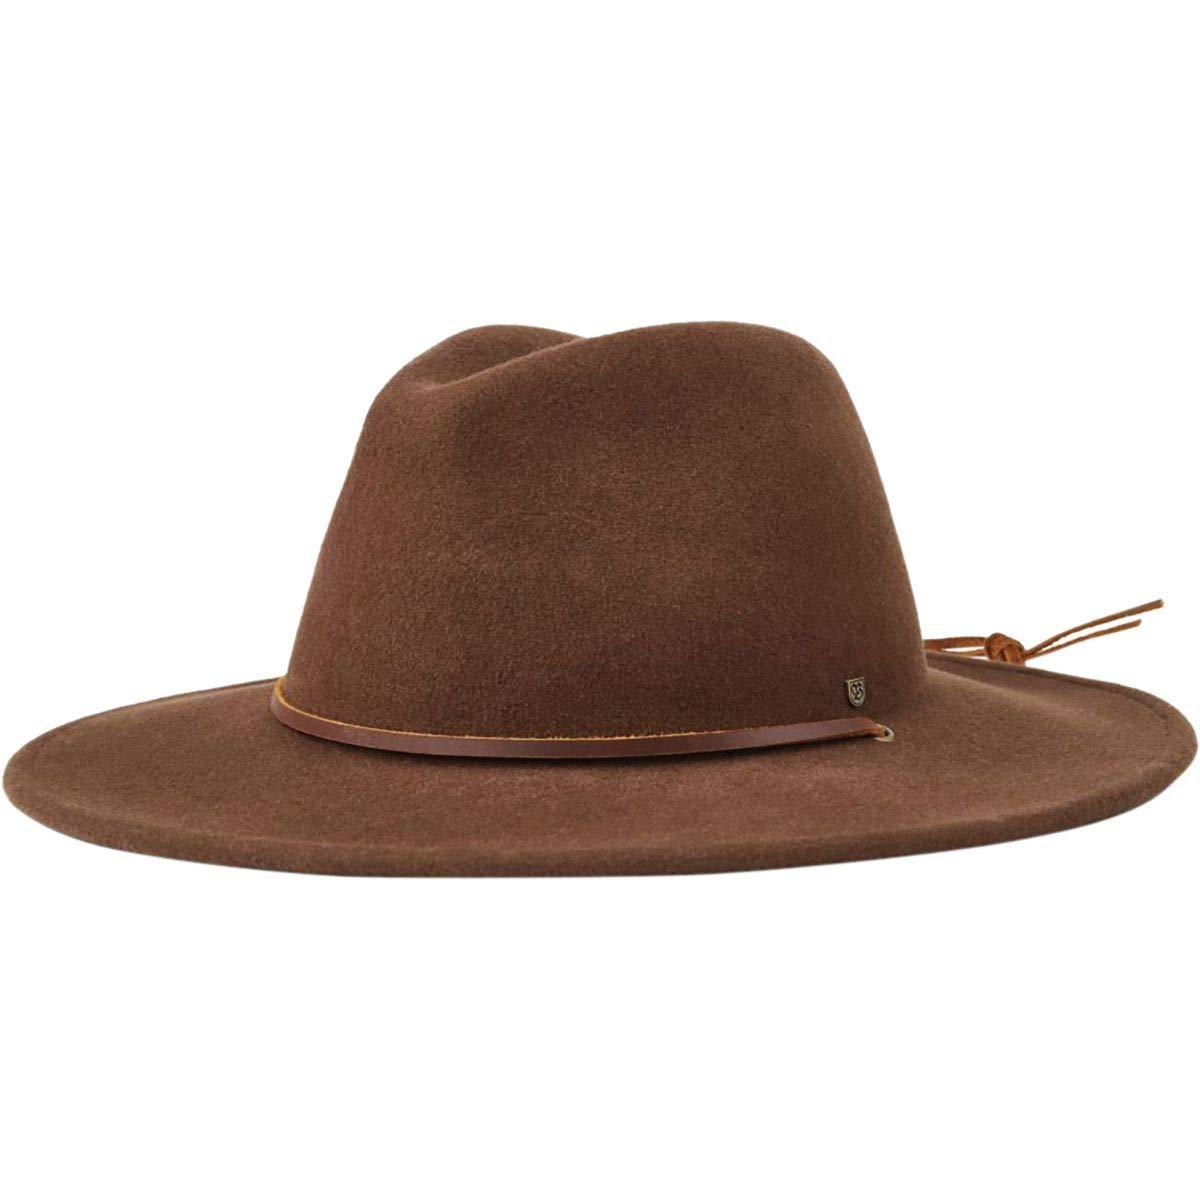 a0eb82a76401a Galleon - Brixton Men s Field Wide Brim Felt Fedora Hat